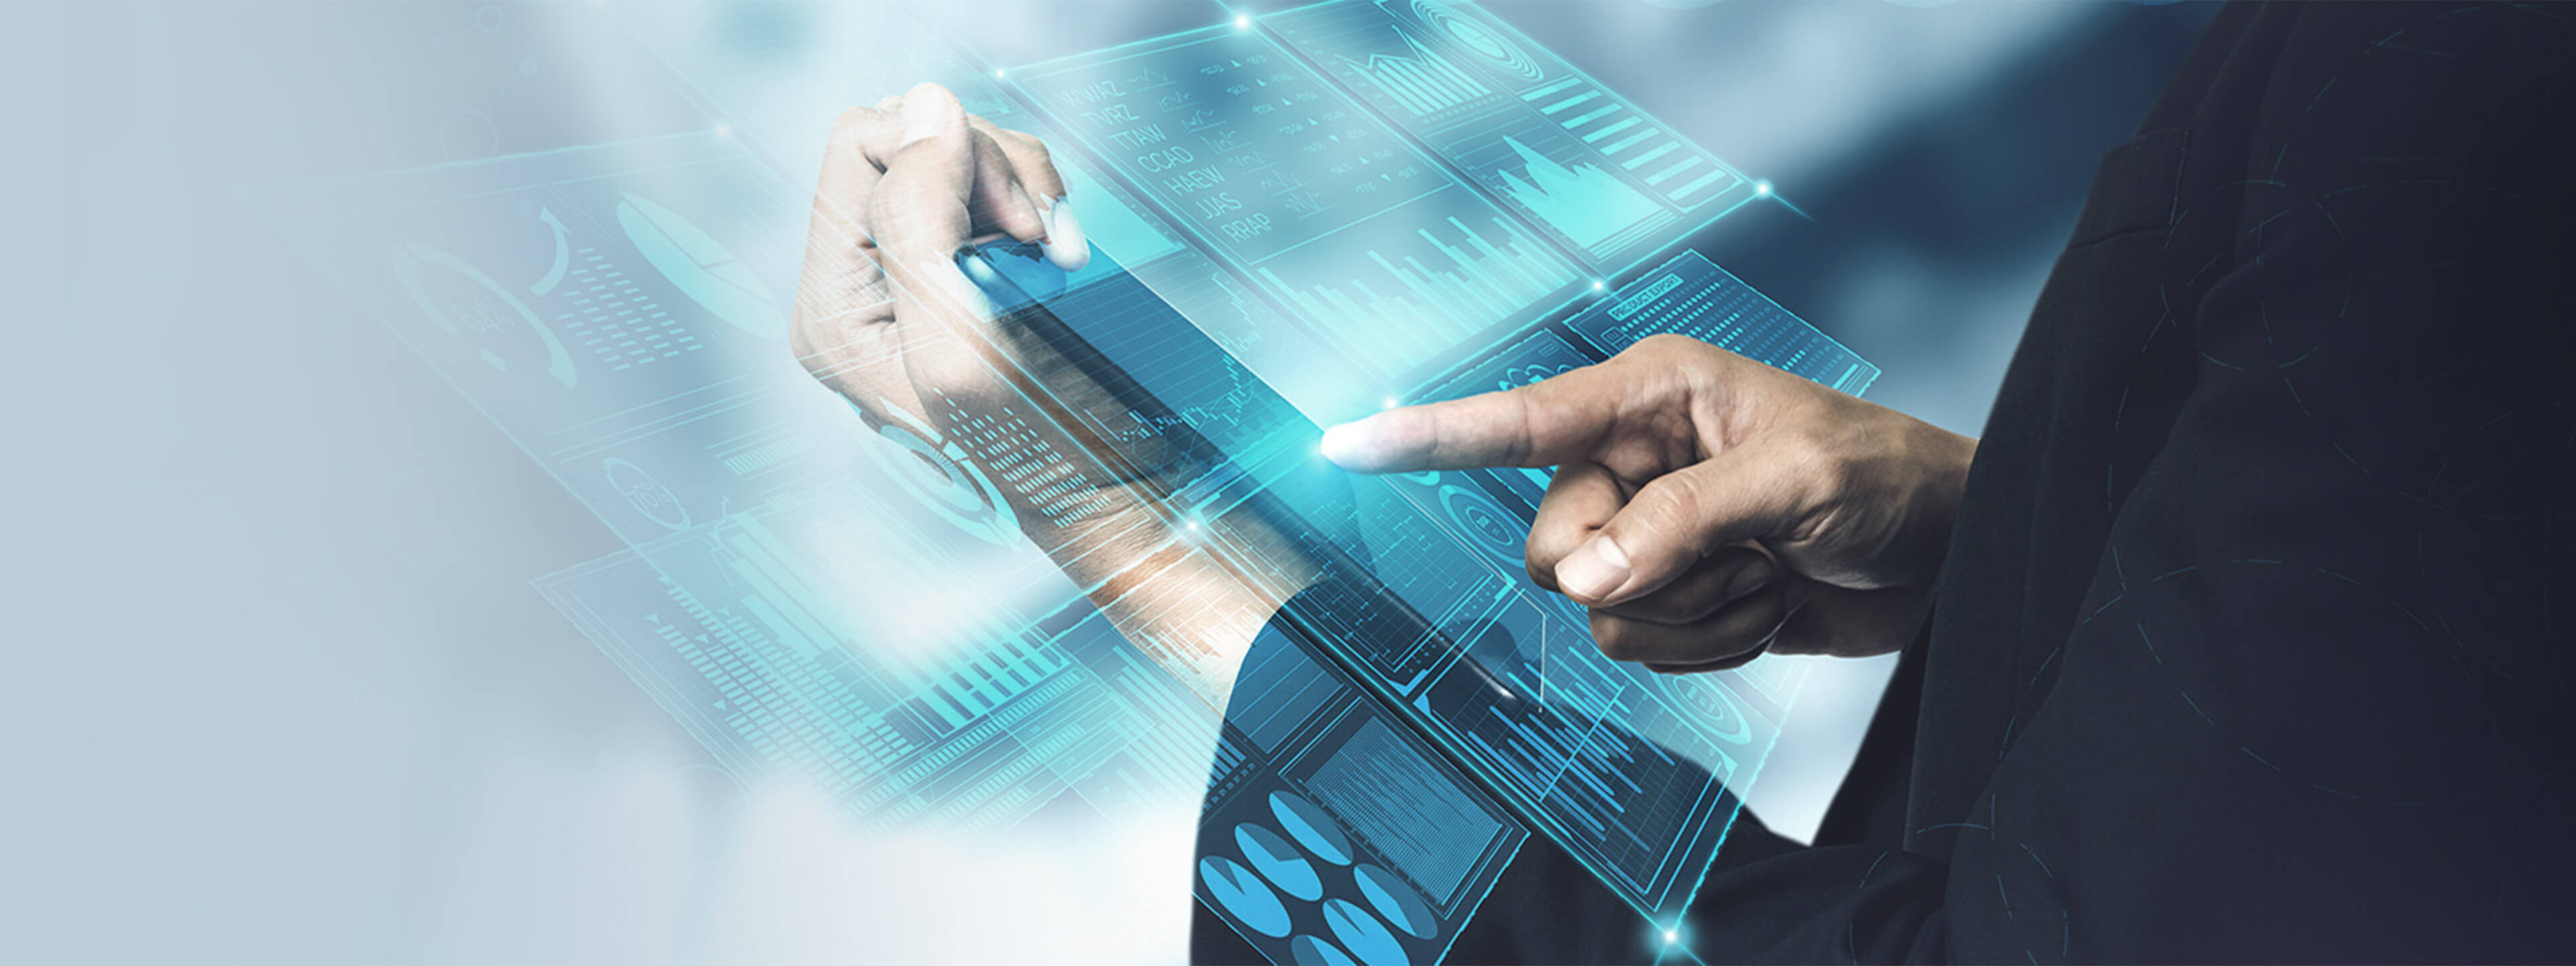 Transforming-a-threat-into-an-opportunity-through-Fintech